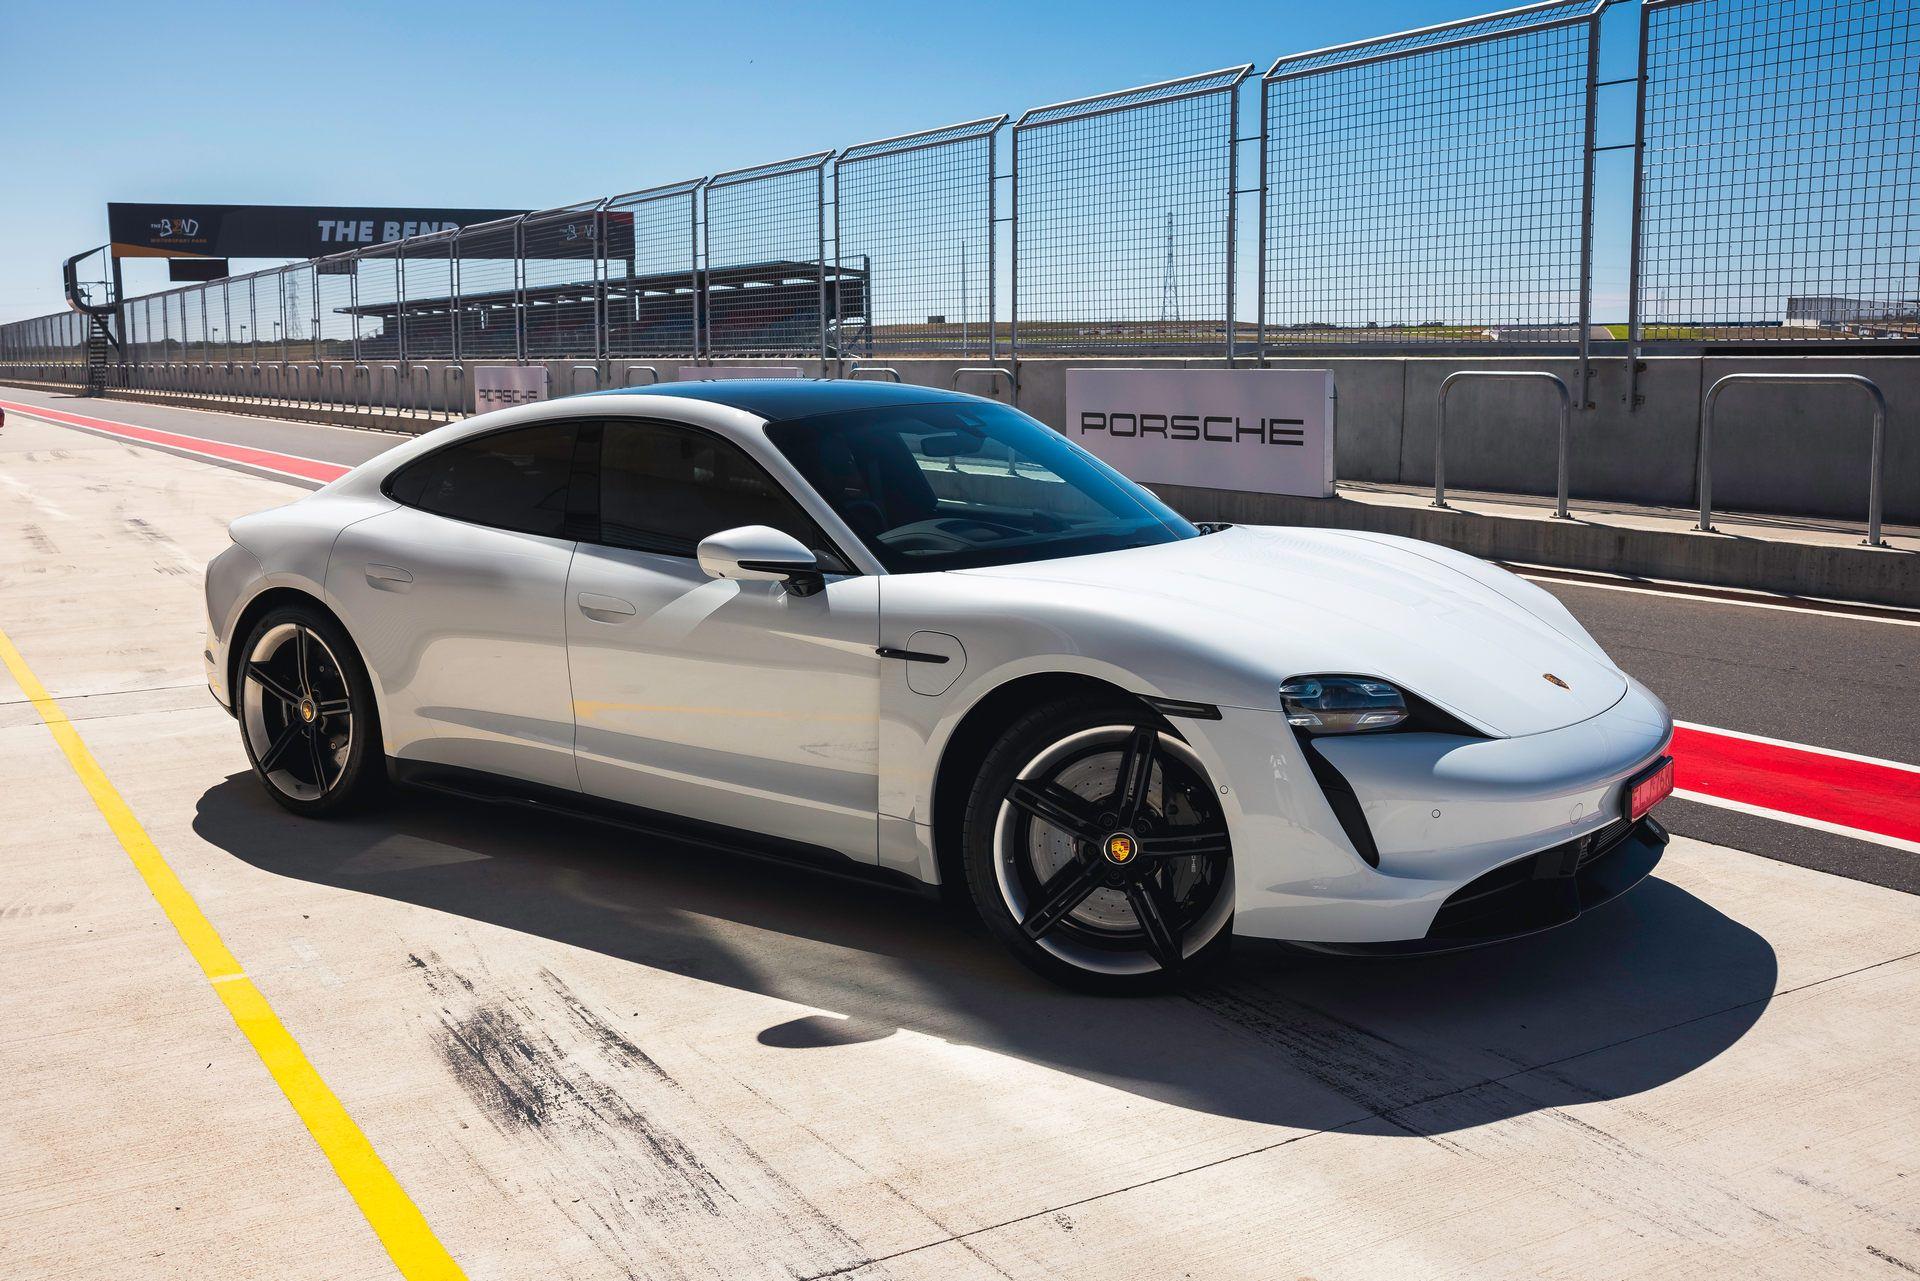 Porsche-Taycan-Turbo-S-The-Bend-Motorsport-Park-16